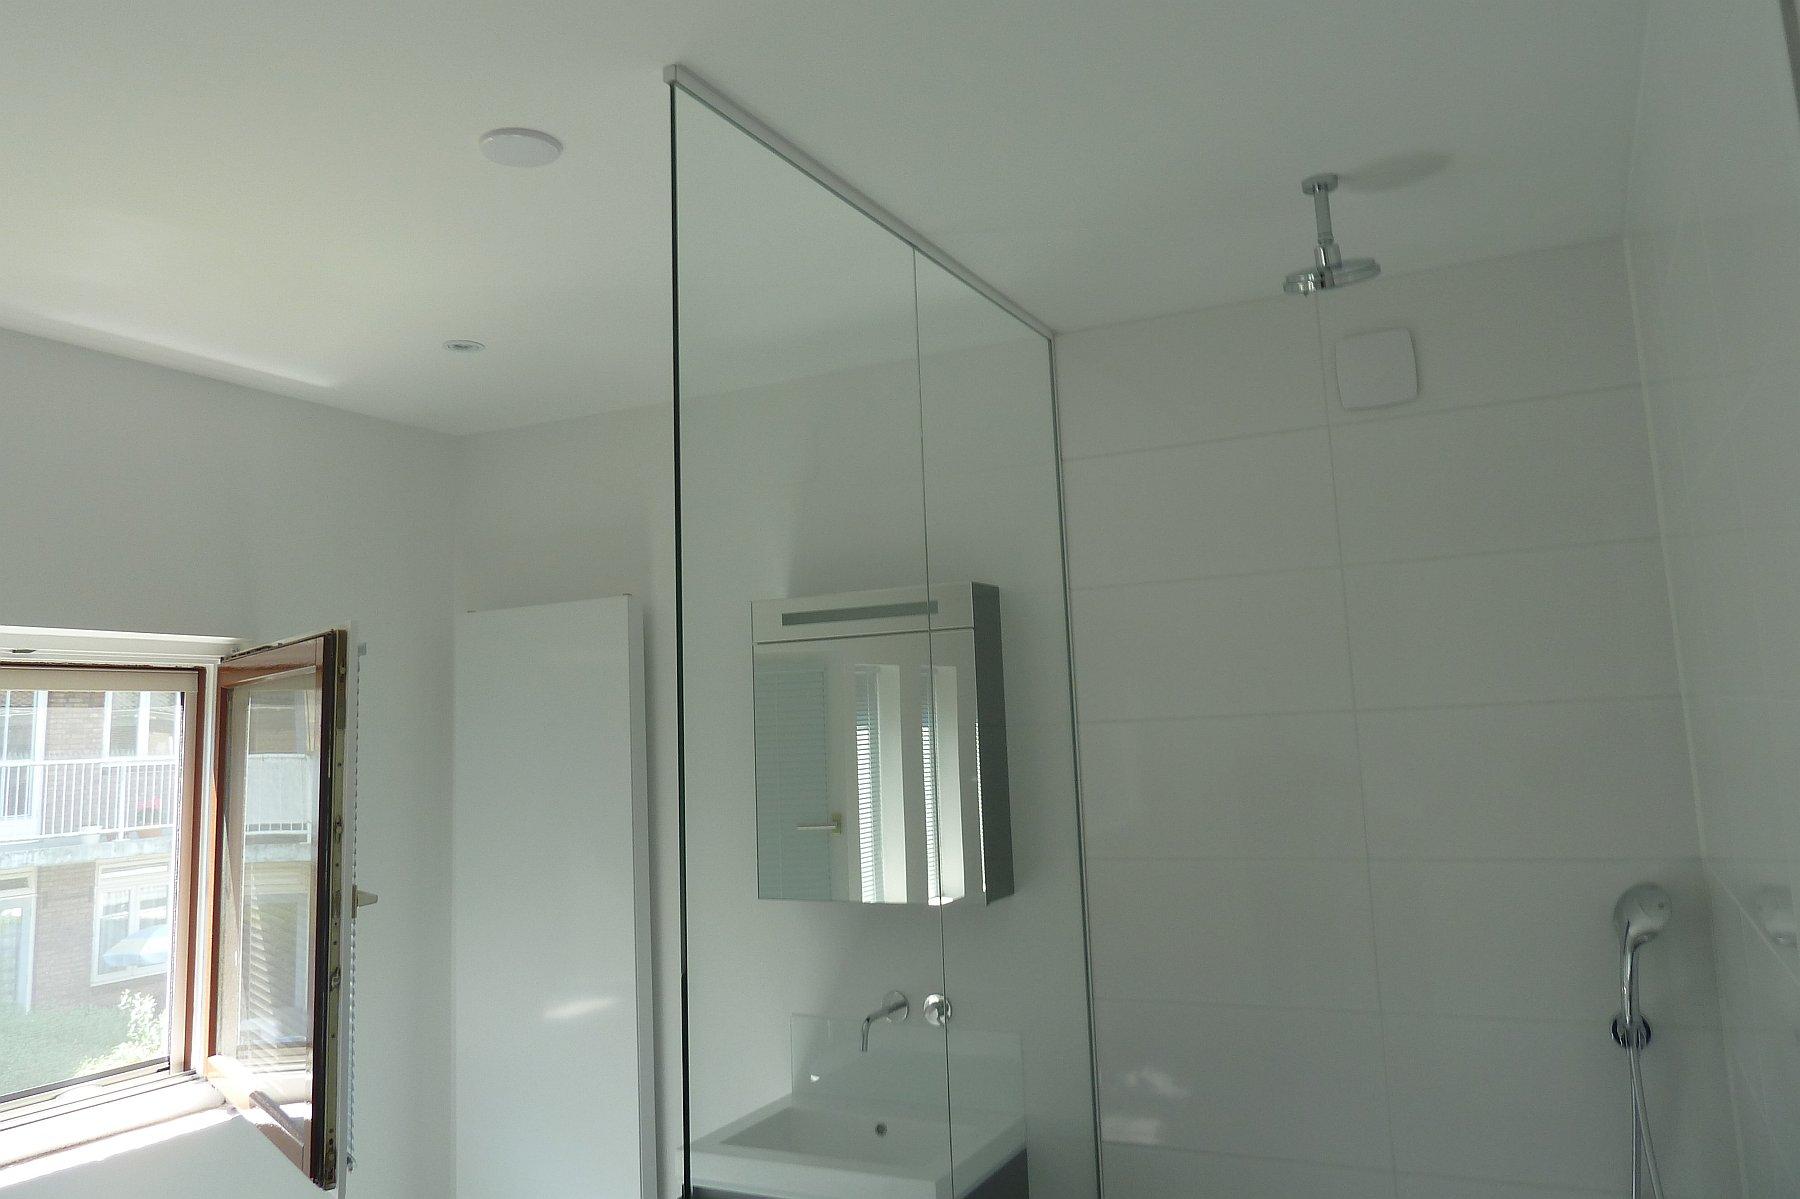 Badkamer Douchewand Glas : Glazen douchewand plaatsen in rijswijk